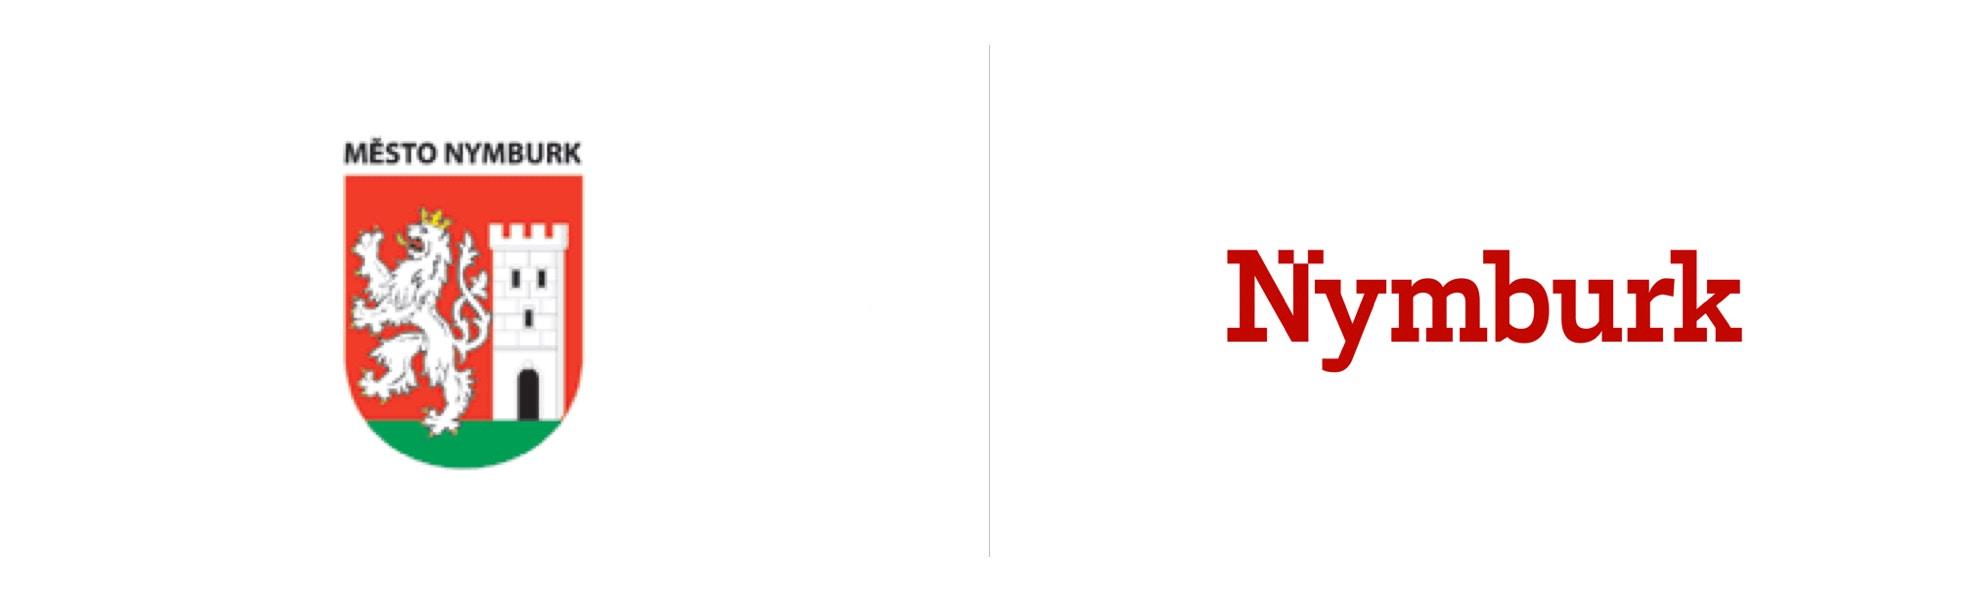 nowe logo nymburka